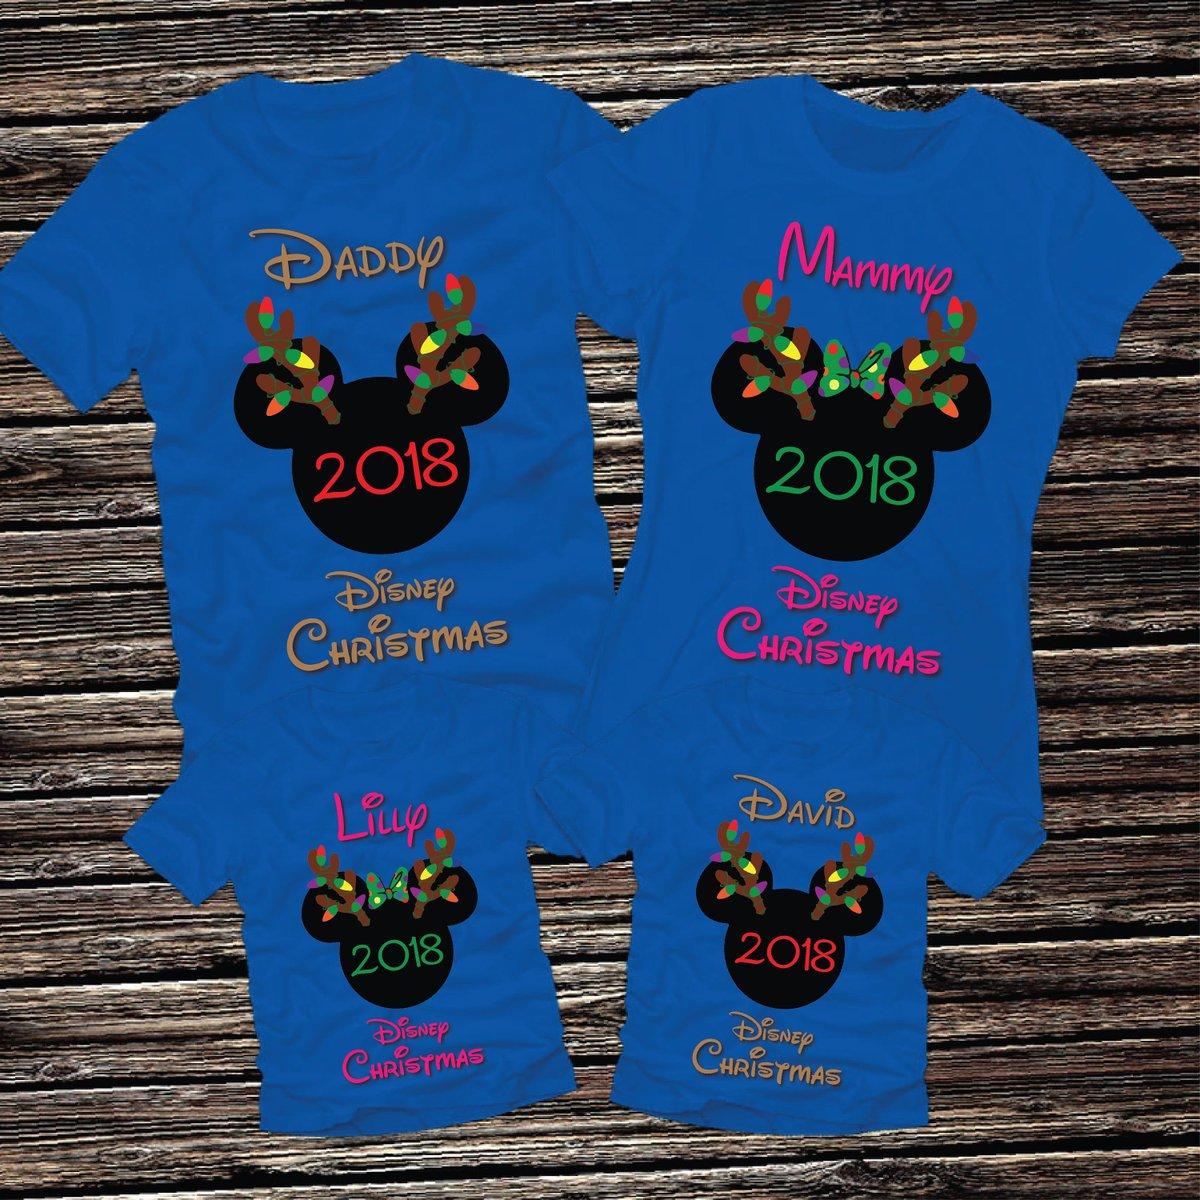 737cdca13839b ... Disney Christmas Reindeer Holiday Family Matching Minnie Mickey Mouse  World Vacation Land Raglan Tee T-Shirt Infant Girls Boys Womens Mens ...